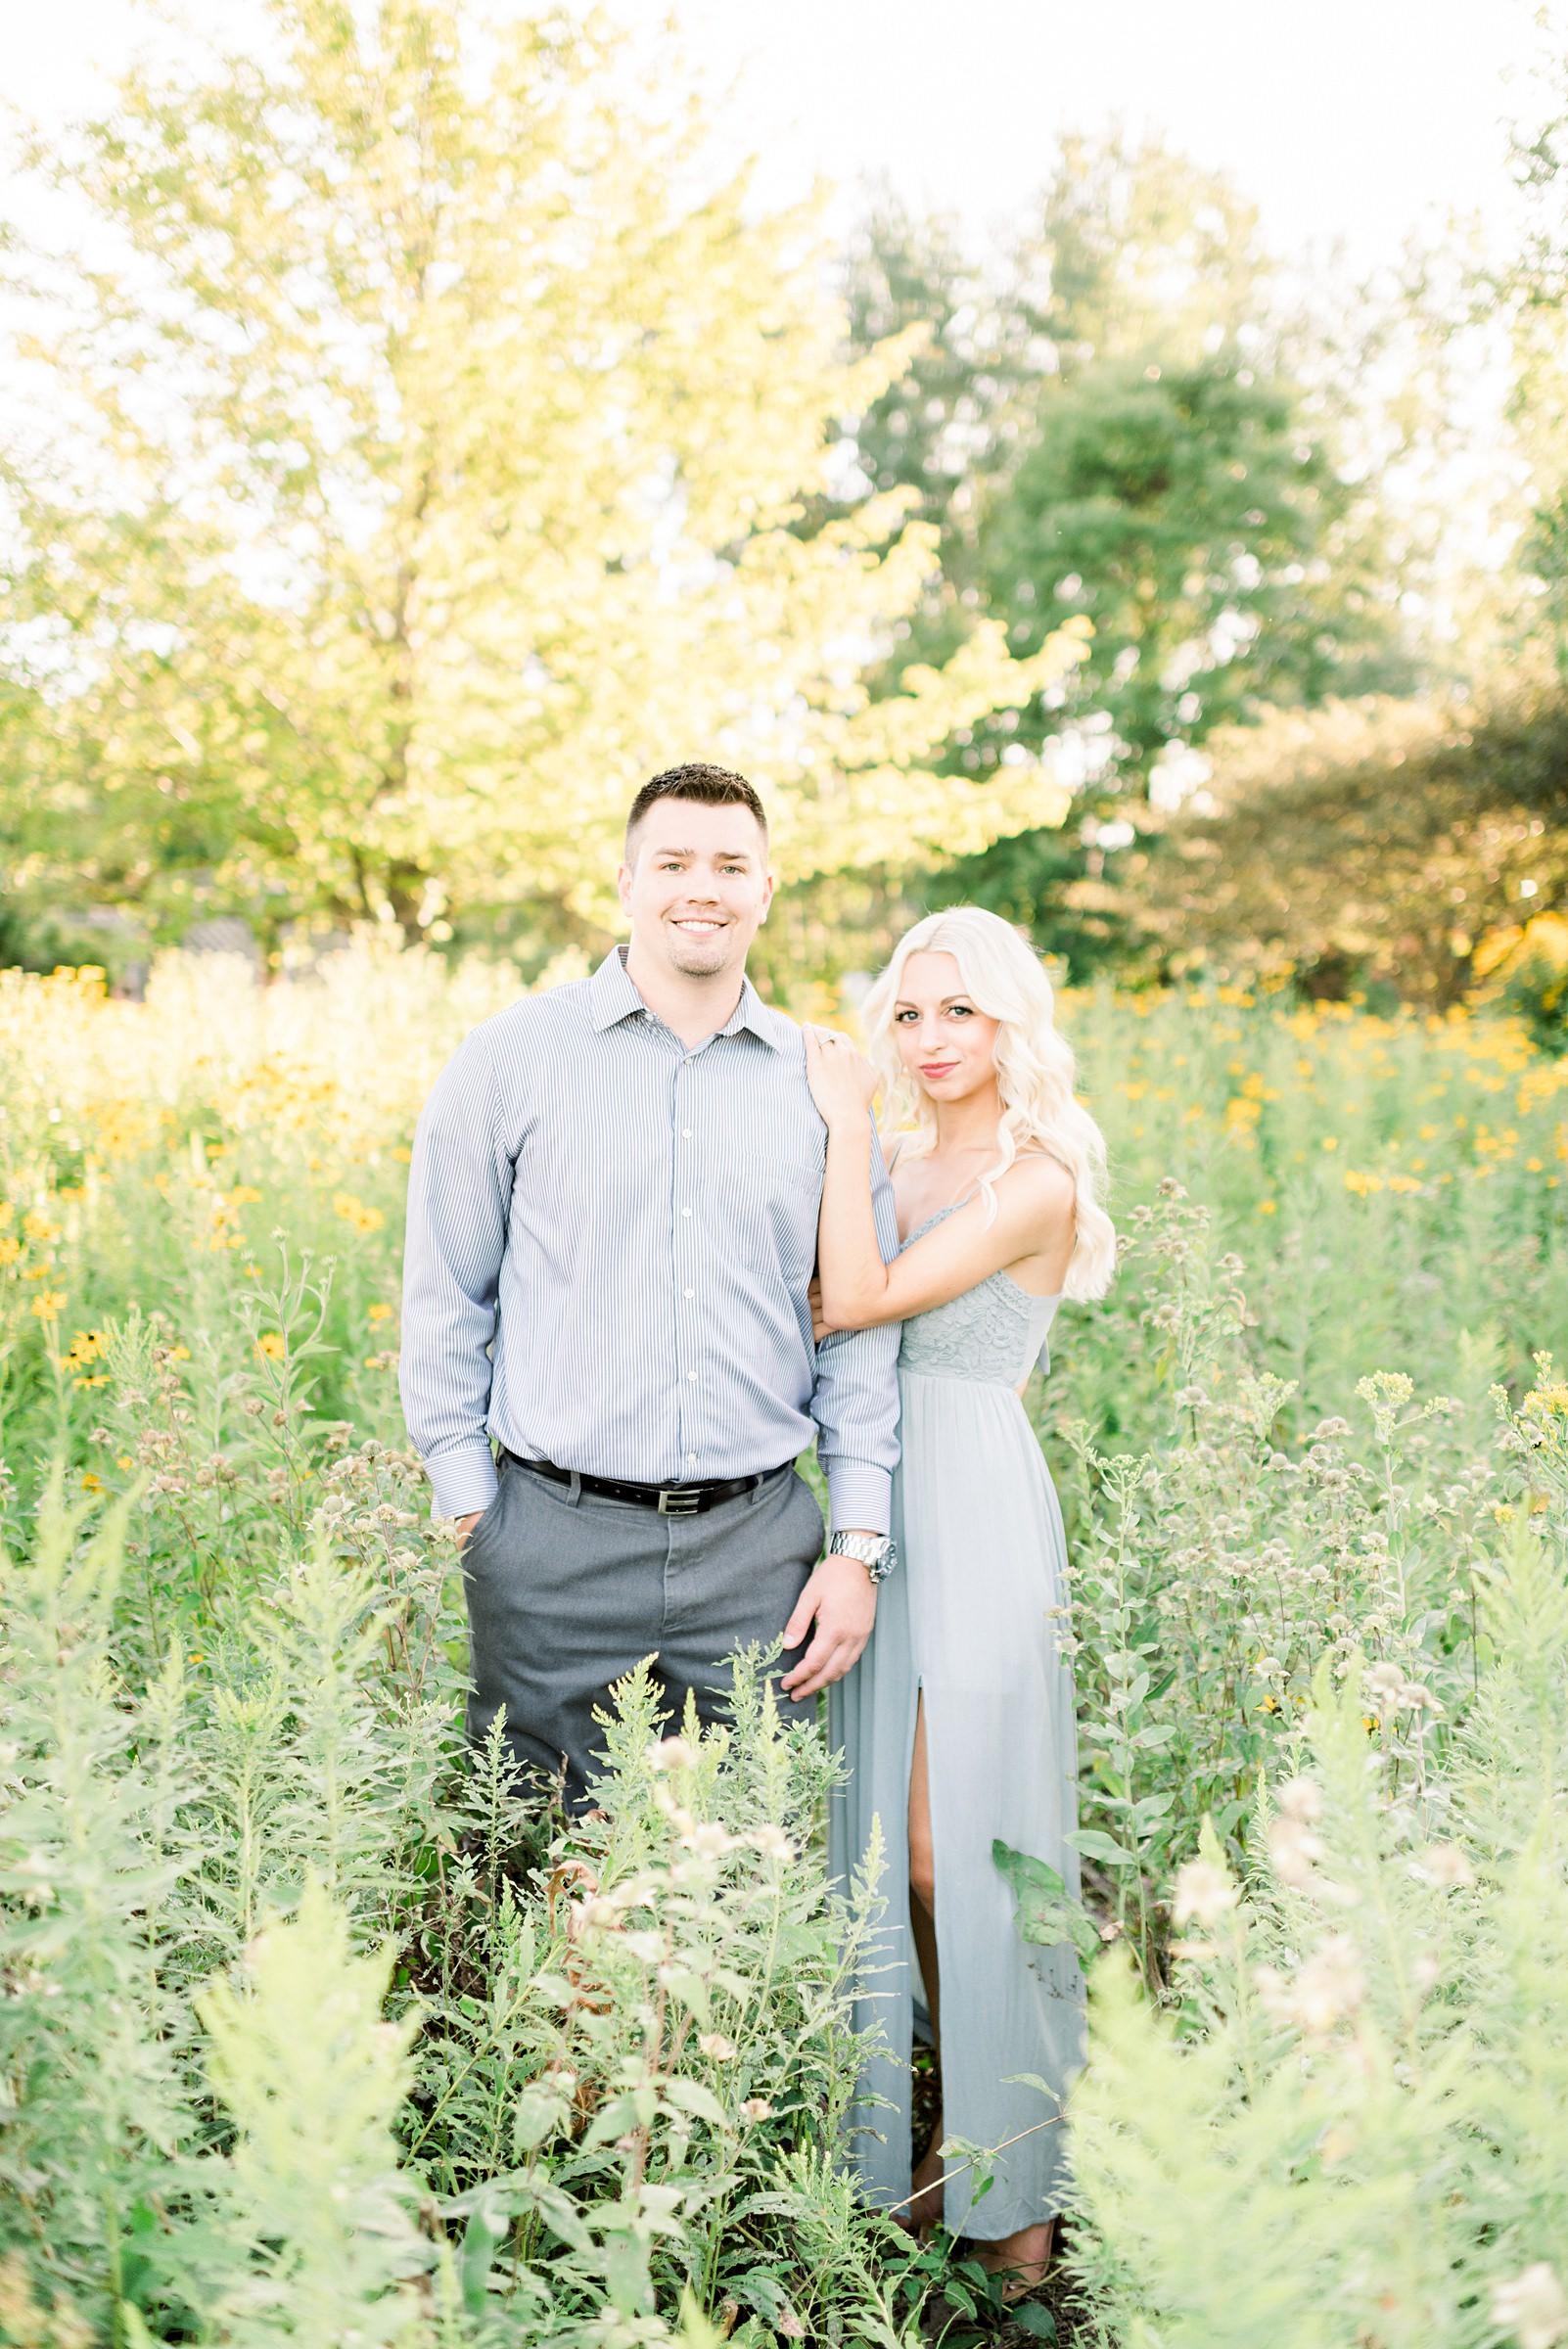 Appleton, WI Engagement Photographer - Larissa Marie Photography